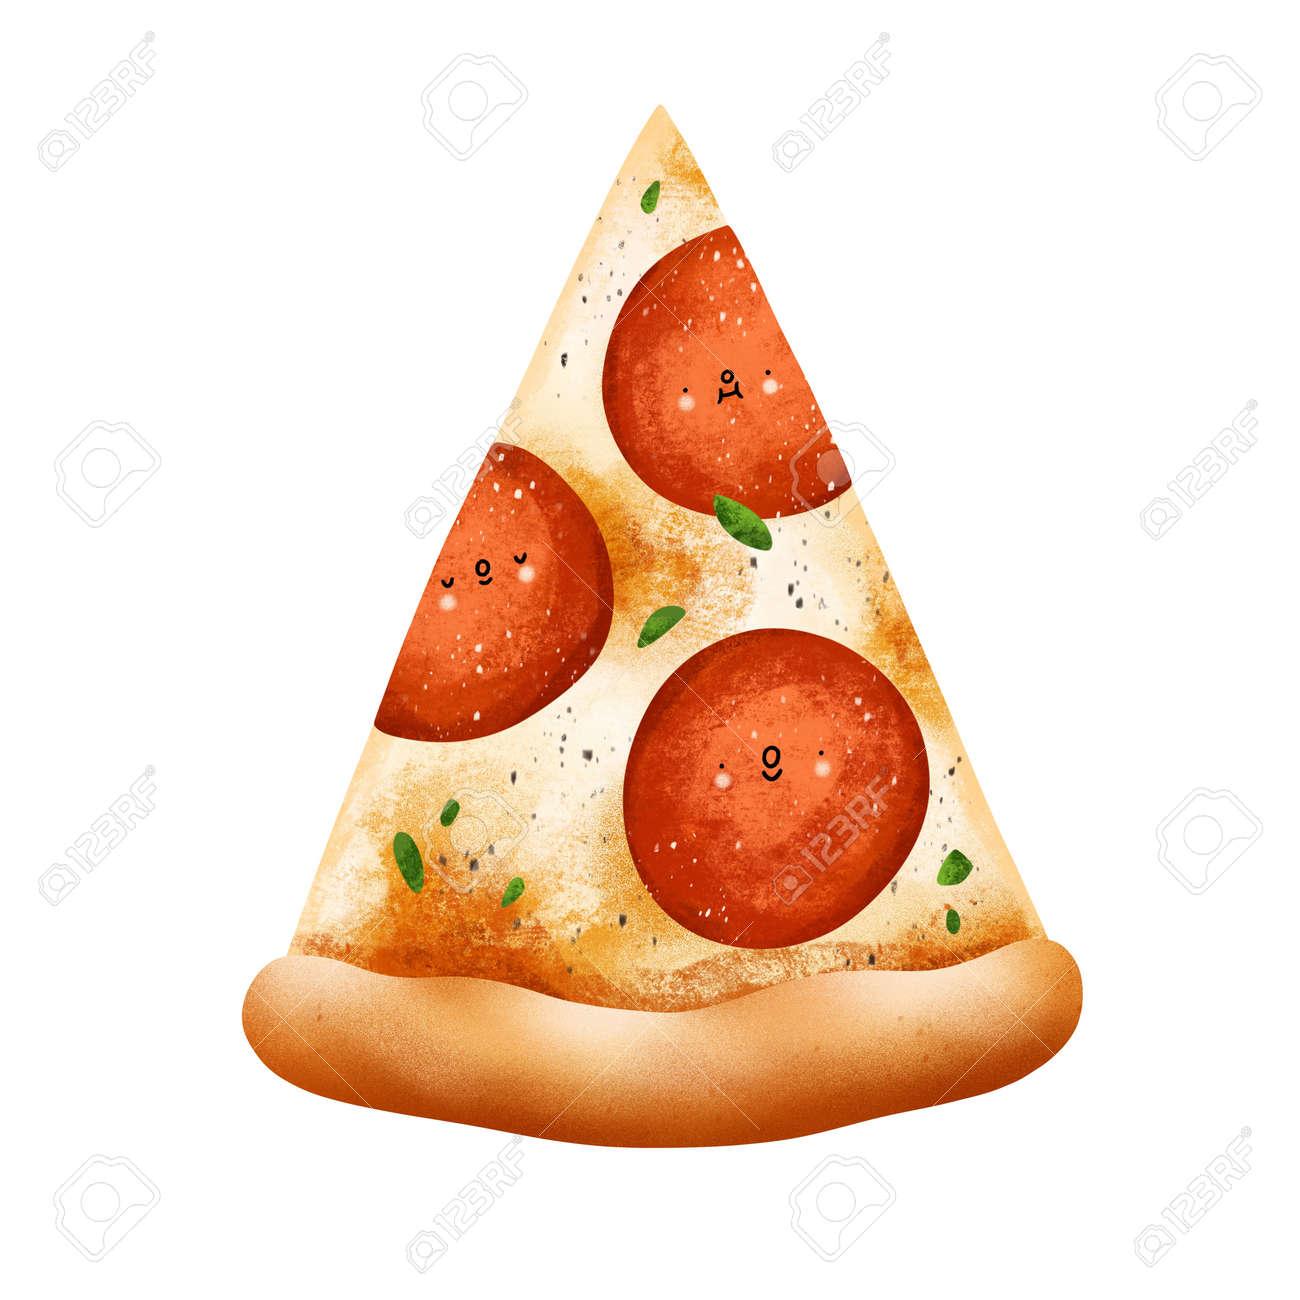 Cute cartoon style pepperoni pizza slice illustration, isolated on white background - 170268200